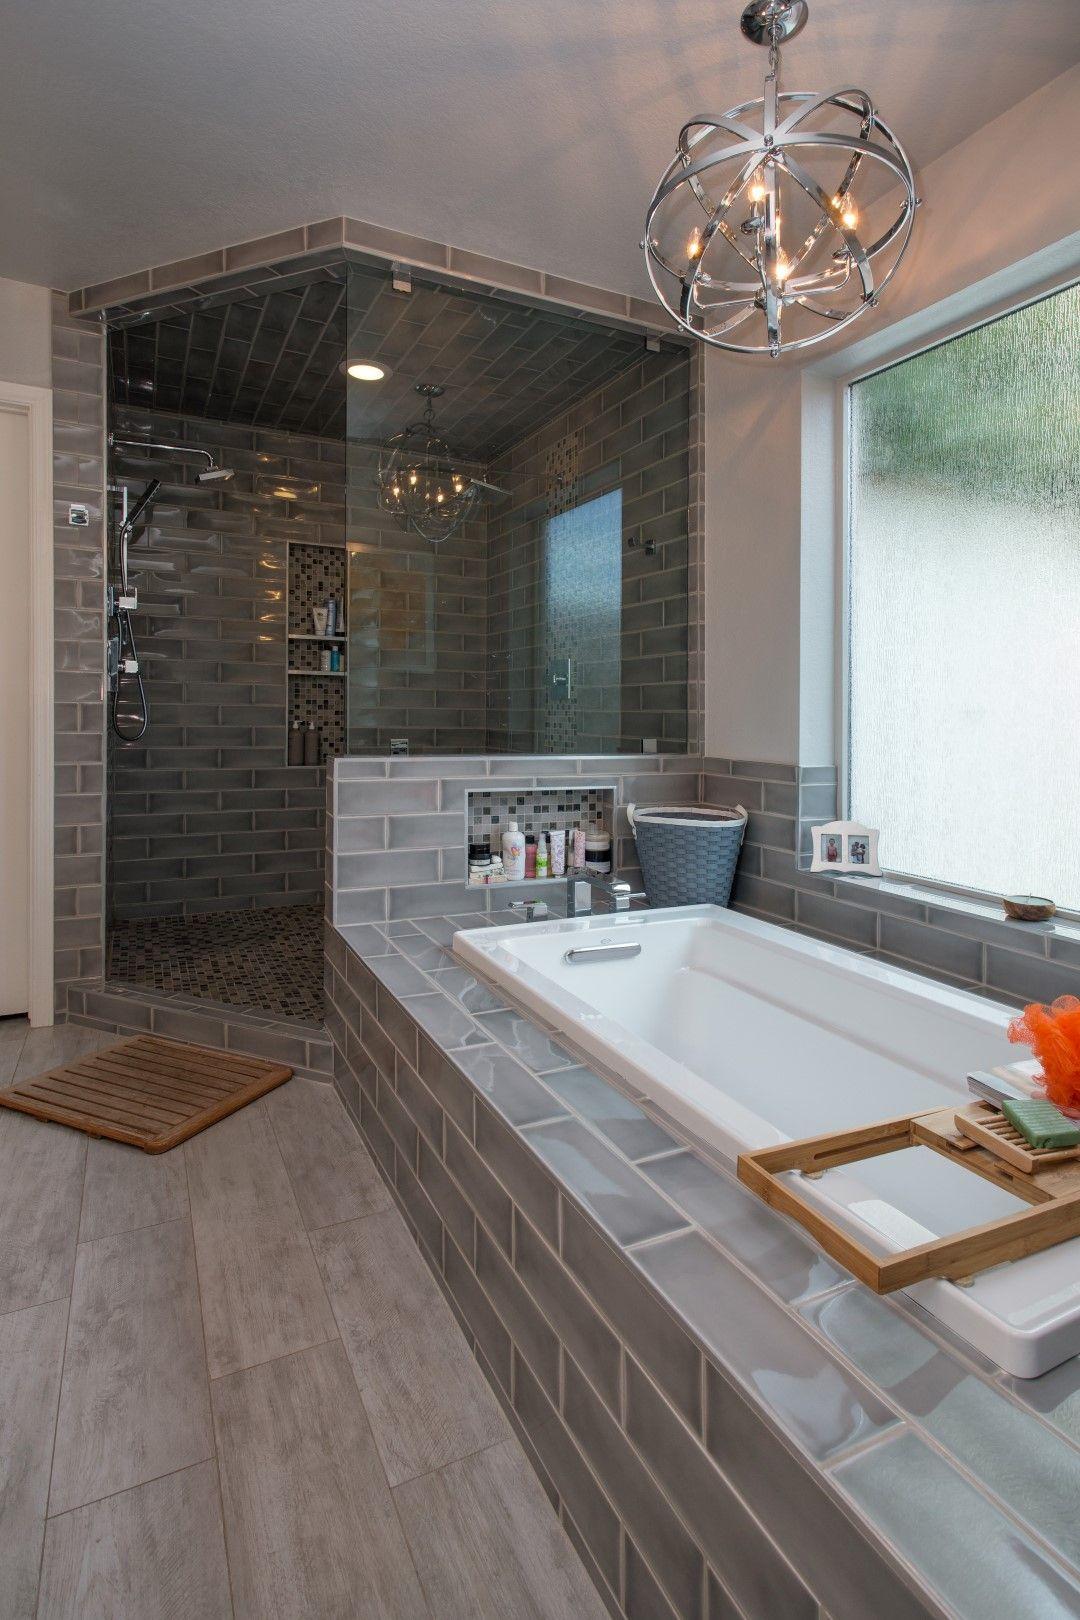 17 Basement Bathroom Ideas On A Budget Tags Small Basement